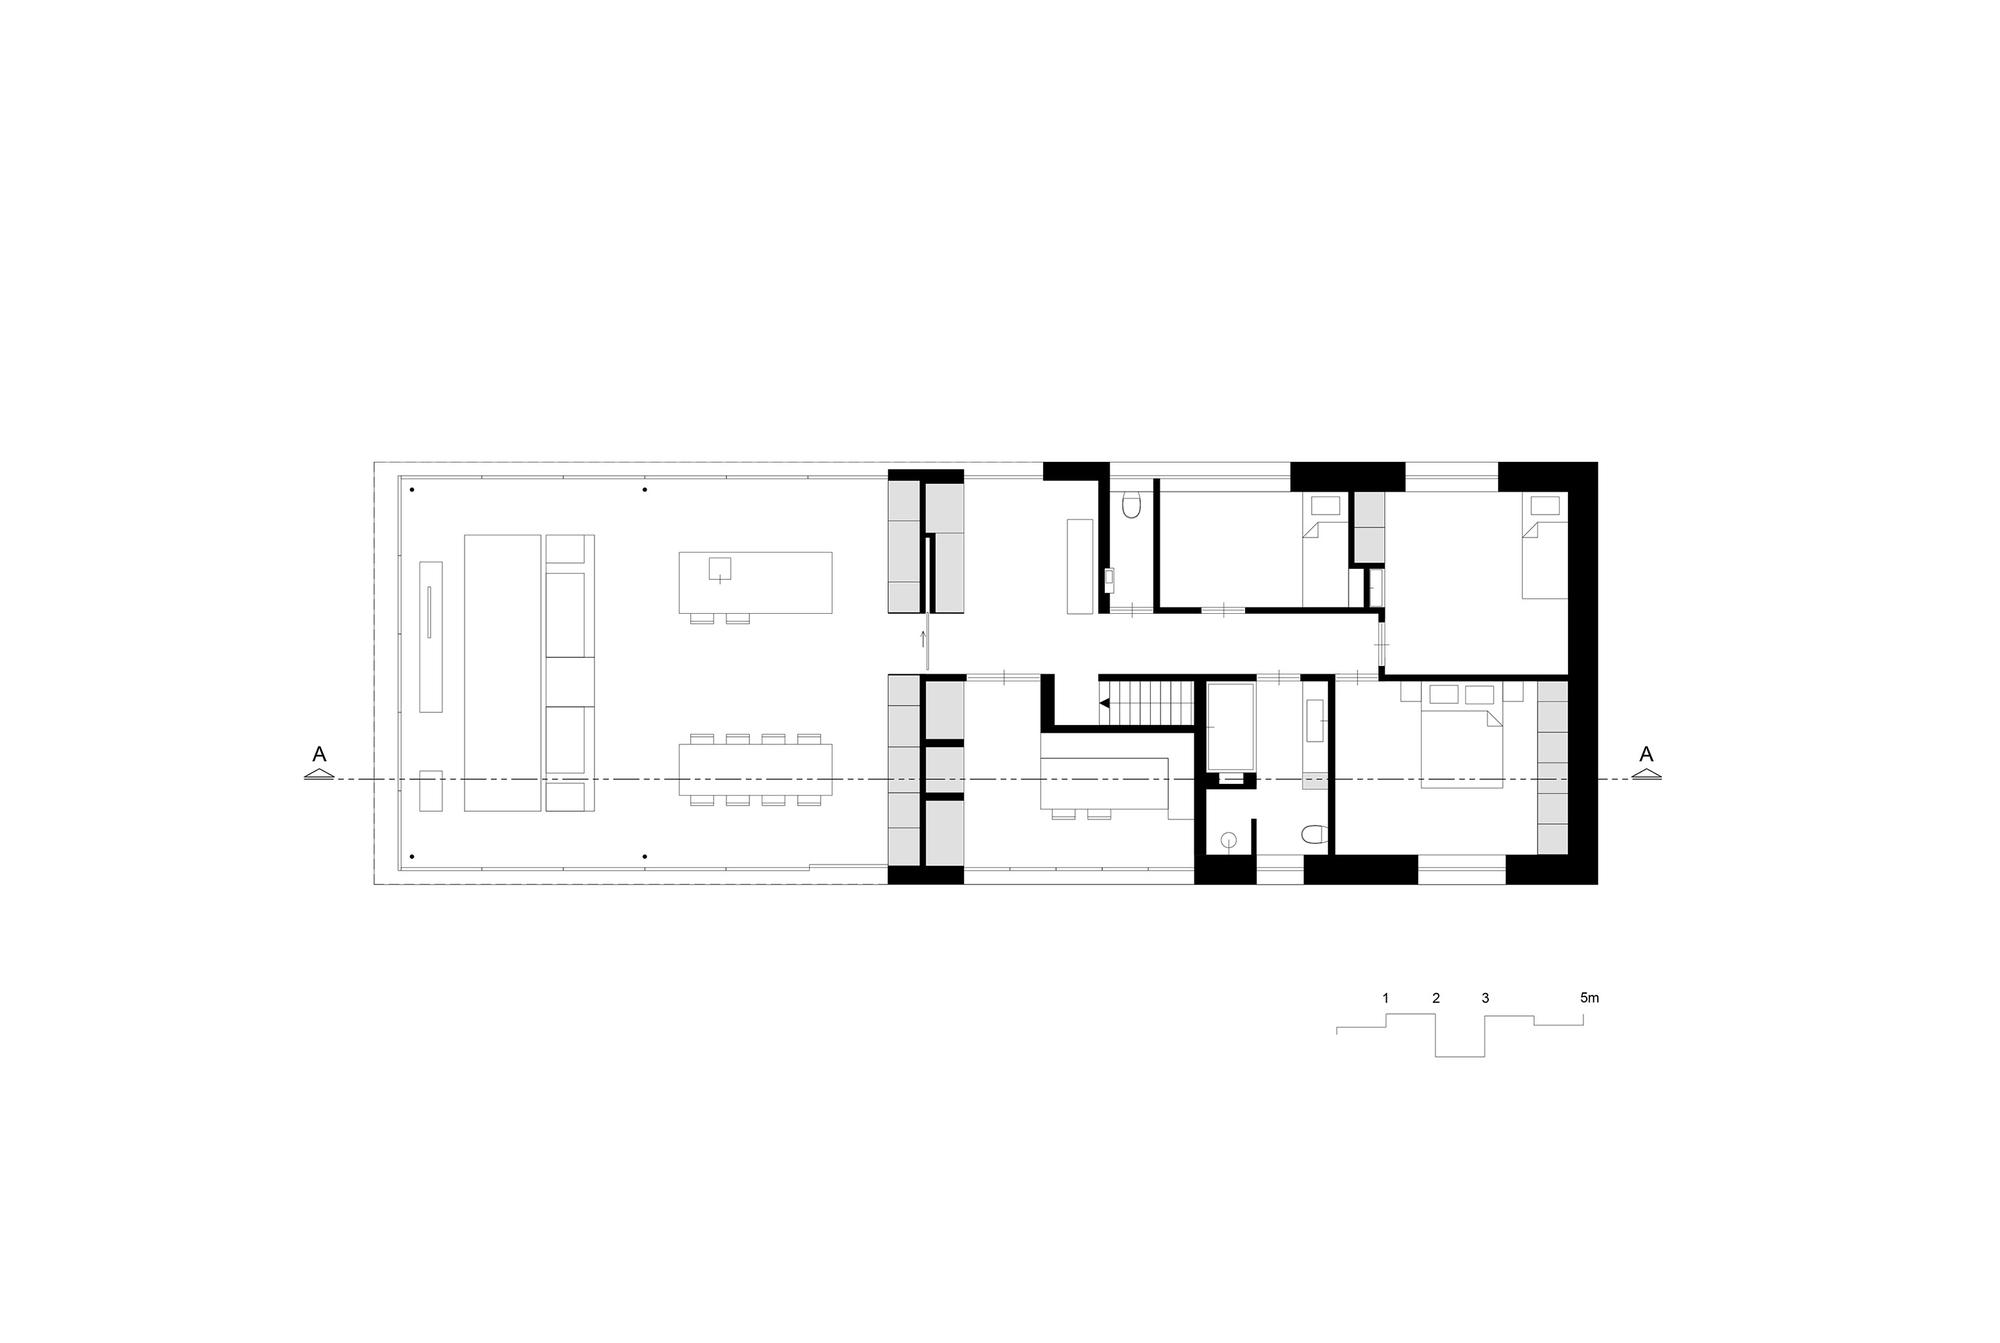 galer a de villa rr reitsema and partners architects 13. Black Bedroom Furniture Sets. Home Design Ideas